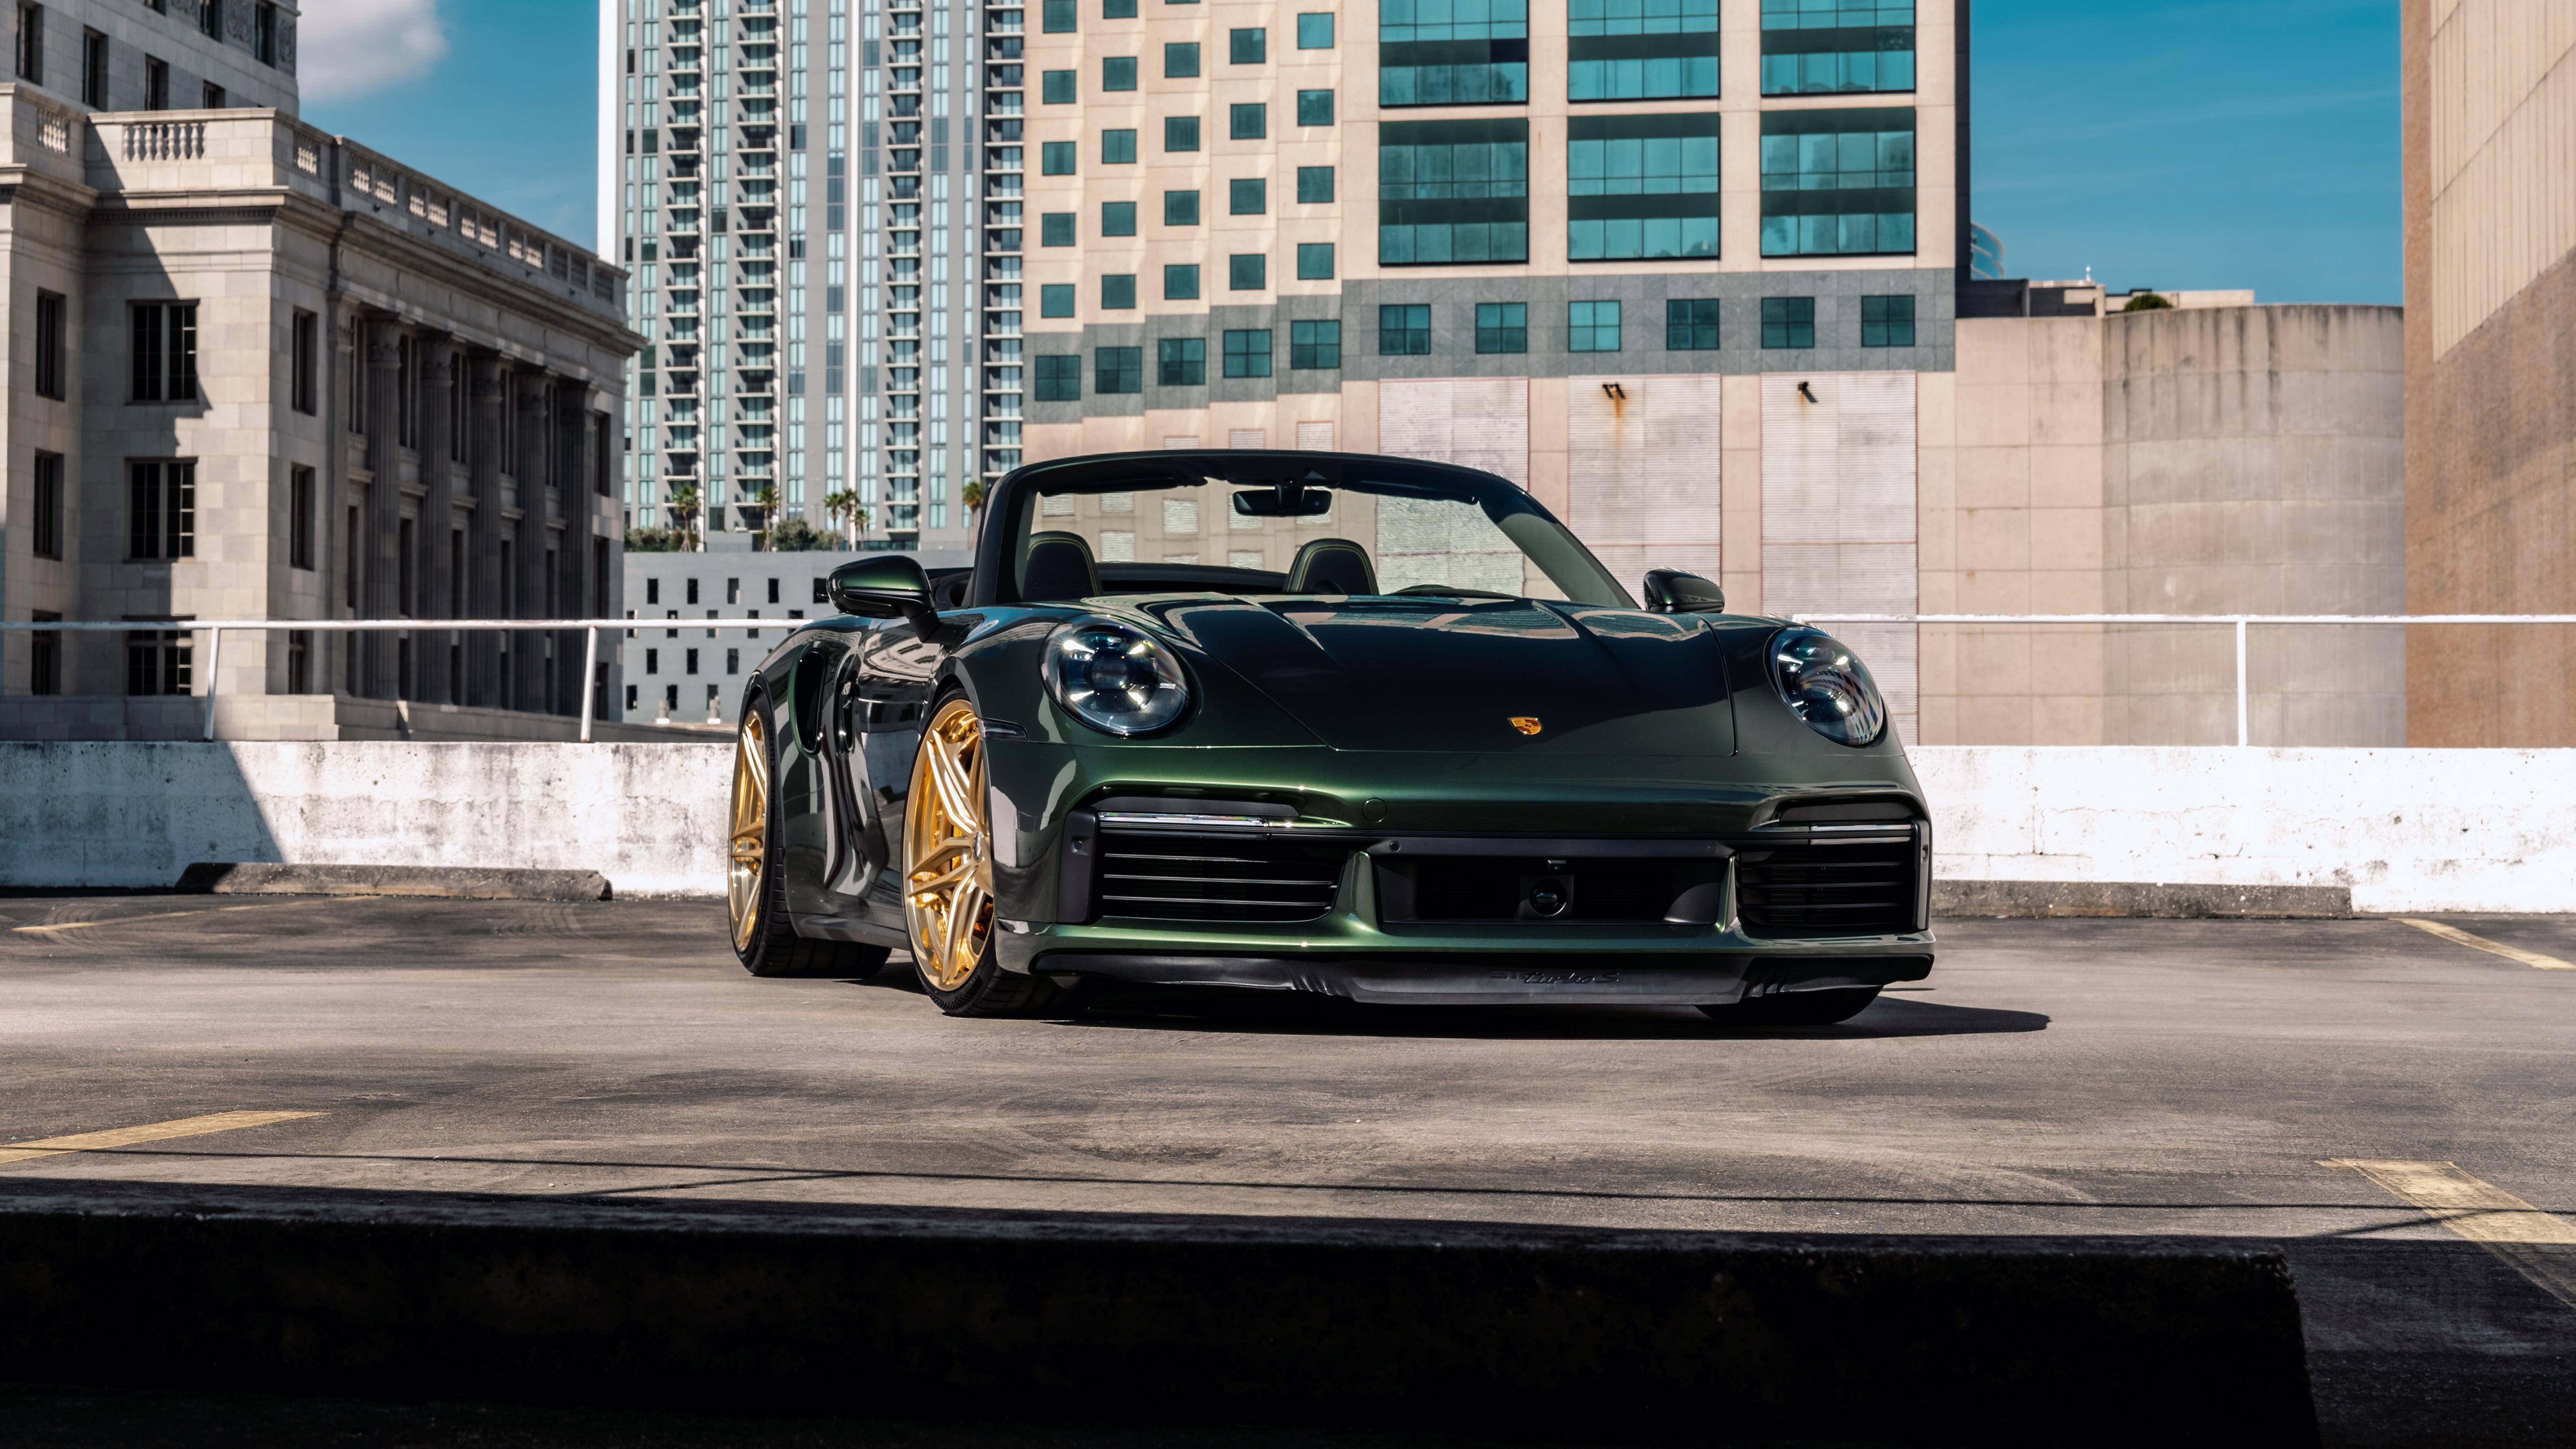 porsche 992 tt 2021 4k 1618919590 - Porsche 992 TT 2021 4k - Porsche 992 TT 2021 4k wallpapers